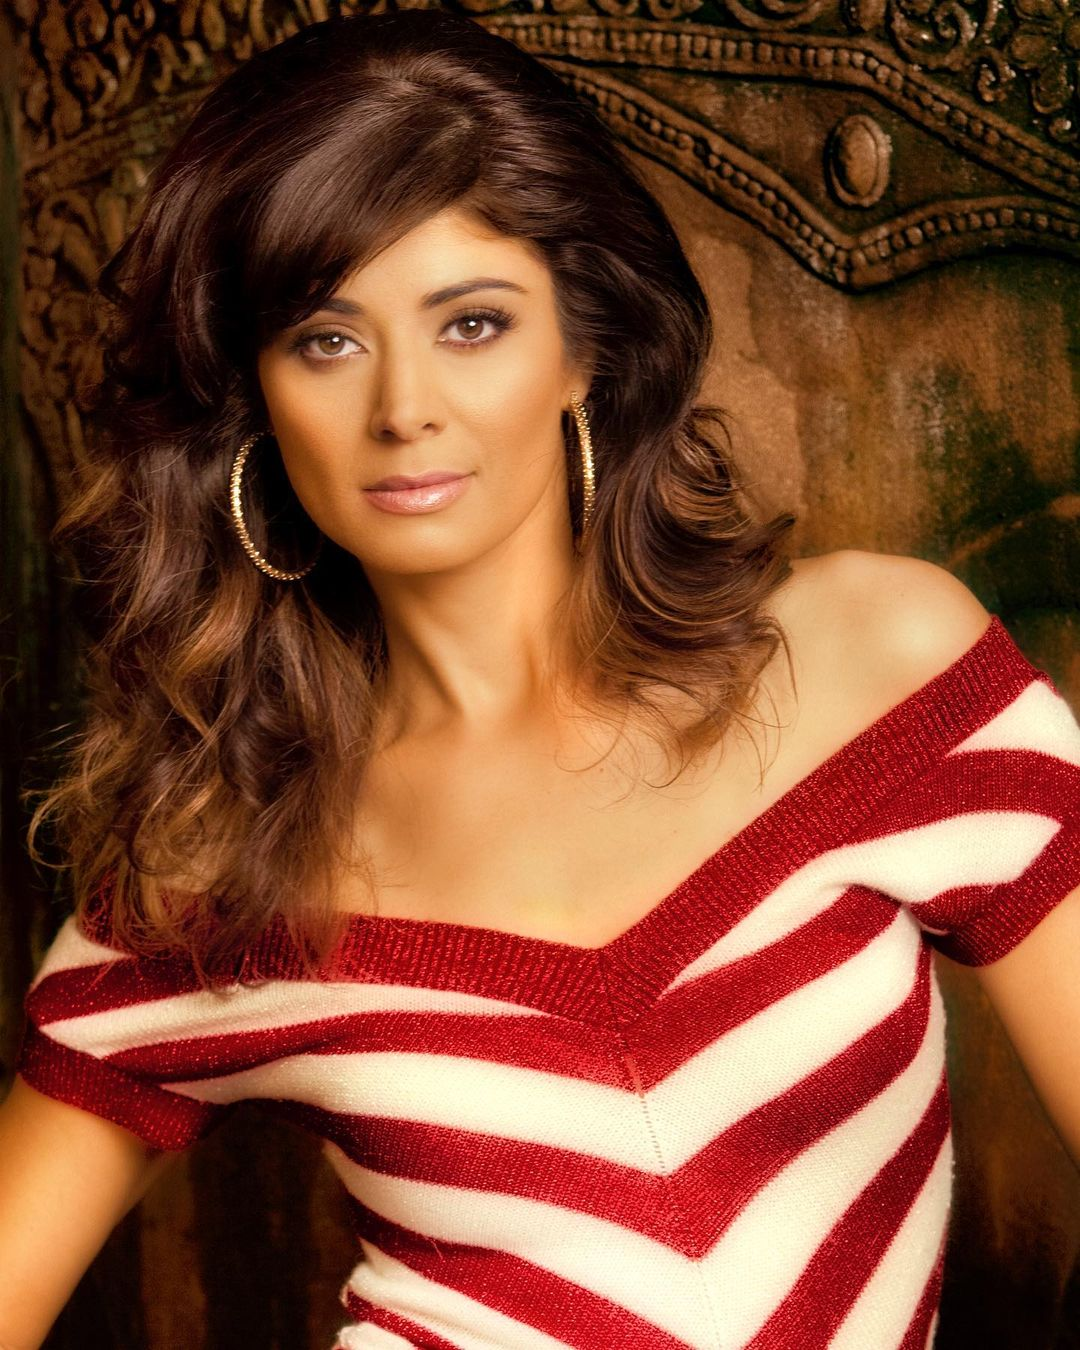 Pooja Batra Indian Actress, Model, TV Host